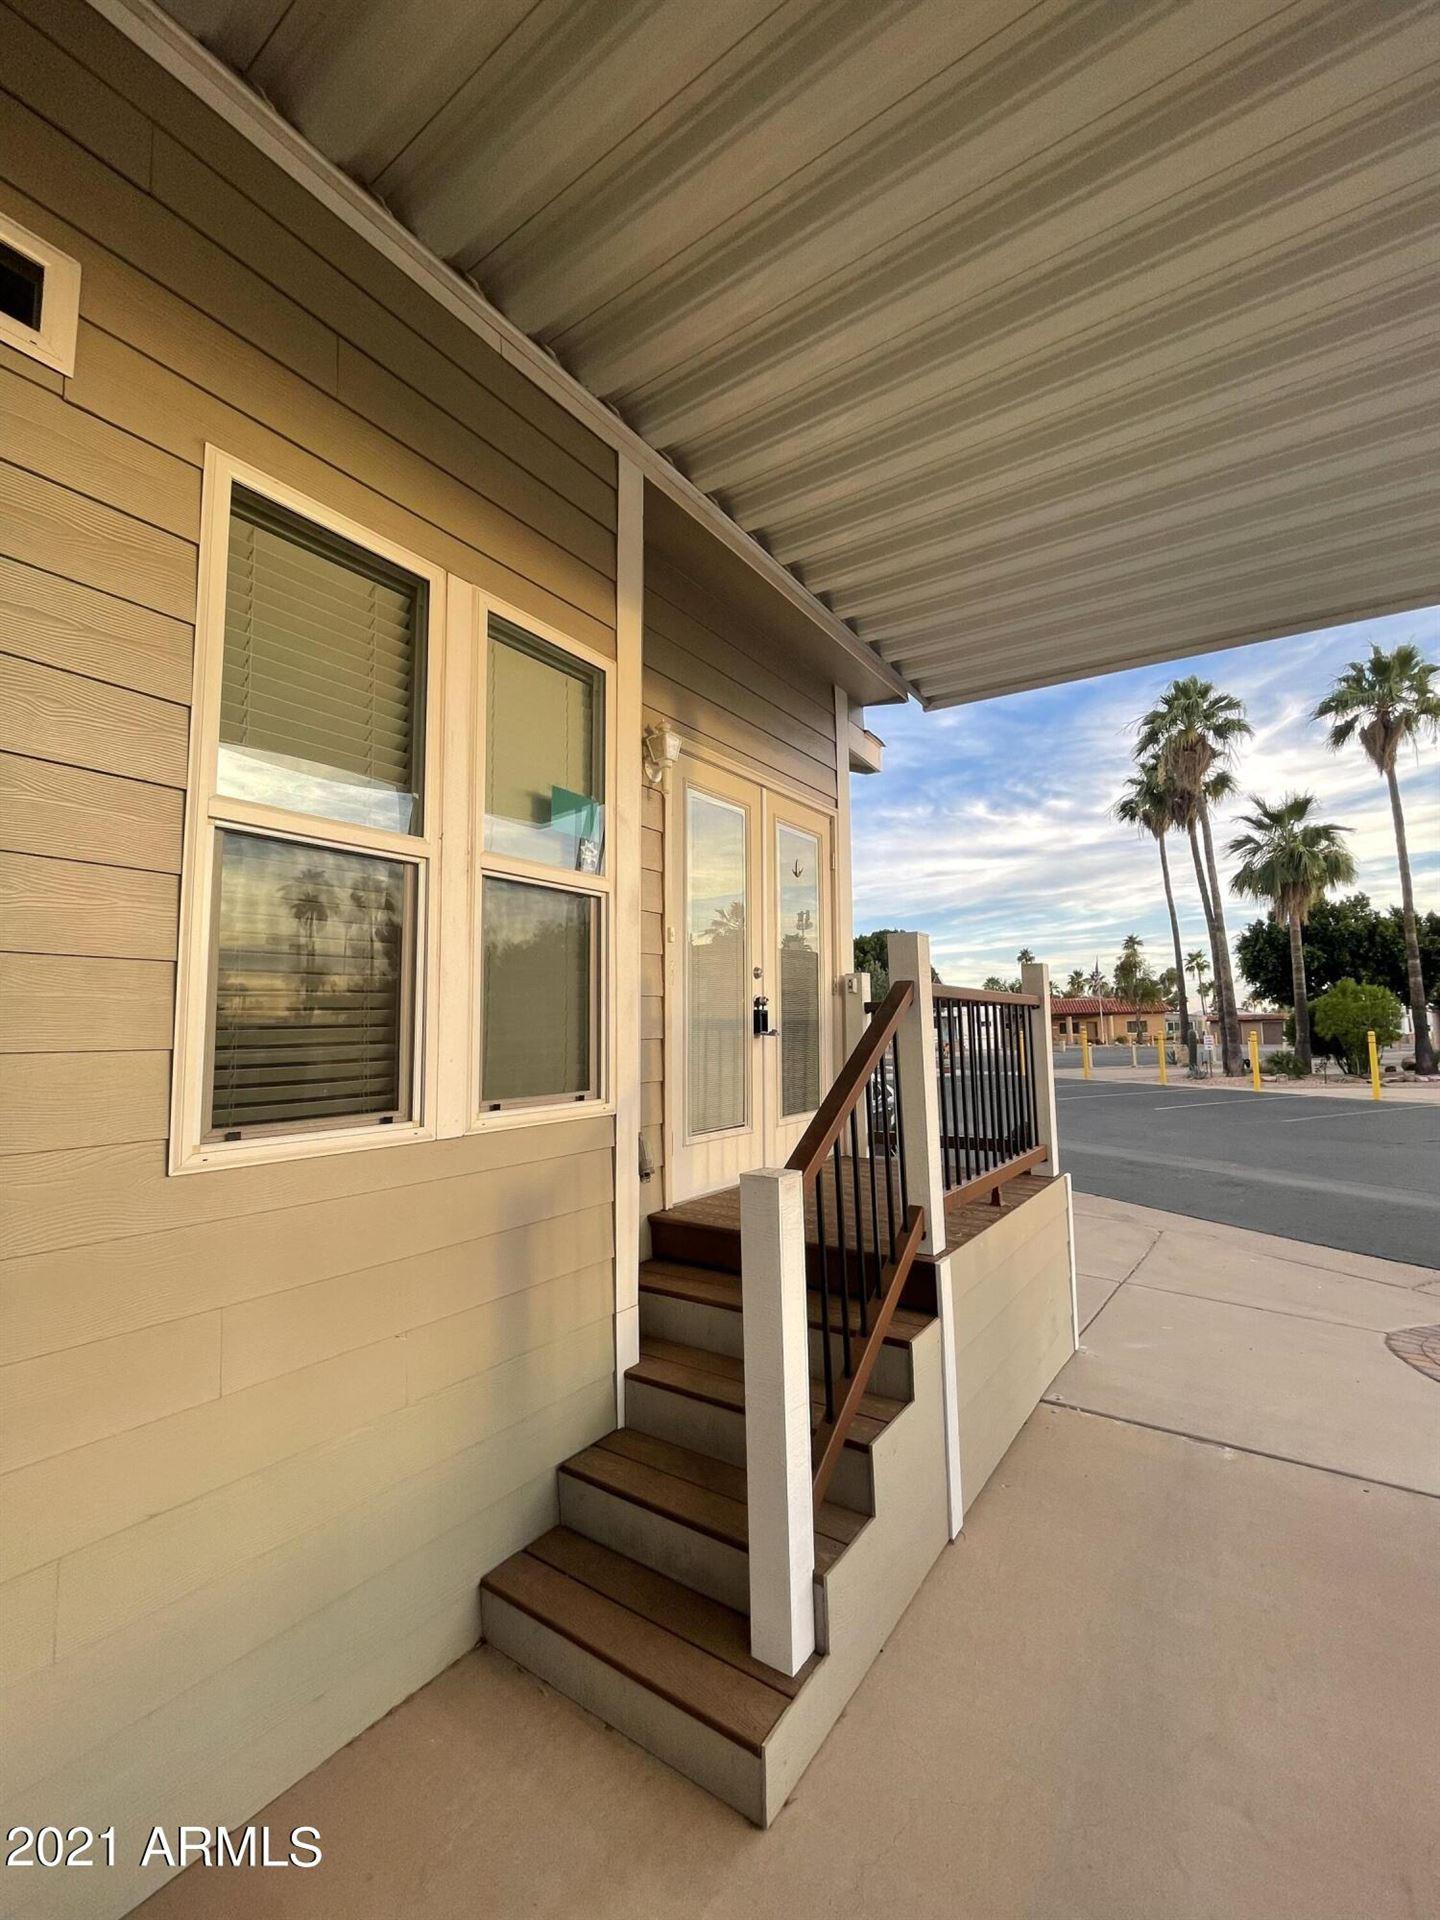 Photo of 2363 S Pomo Avenue, Apache Junction, AZ 85119 (MLS # 6248795)